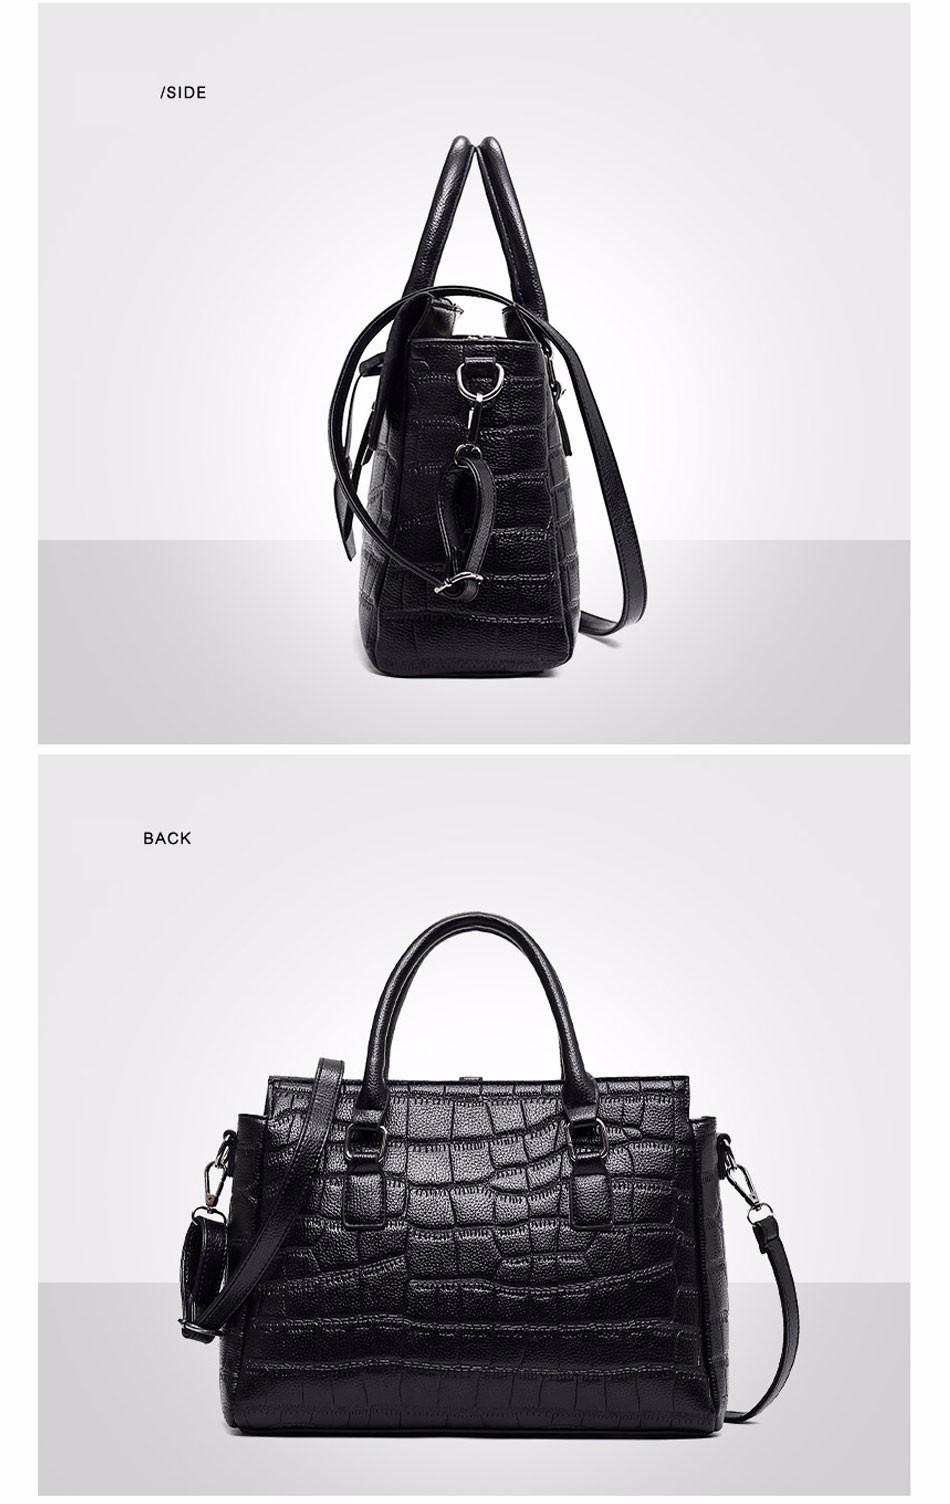 High Quality PU Leather Women's Handbags Shoulder Bag Ladies Hand Bags Stone Casual Women Bag Large Capacity Handbag 17 Sac 11